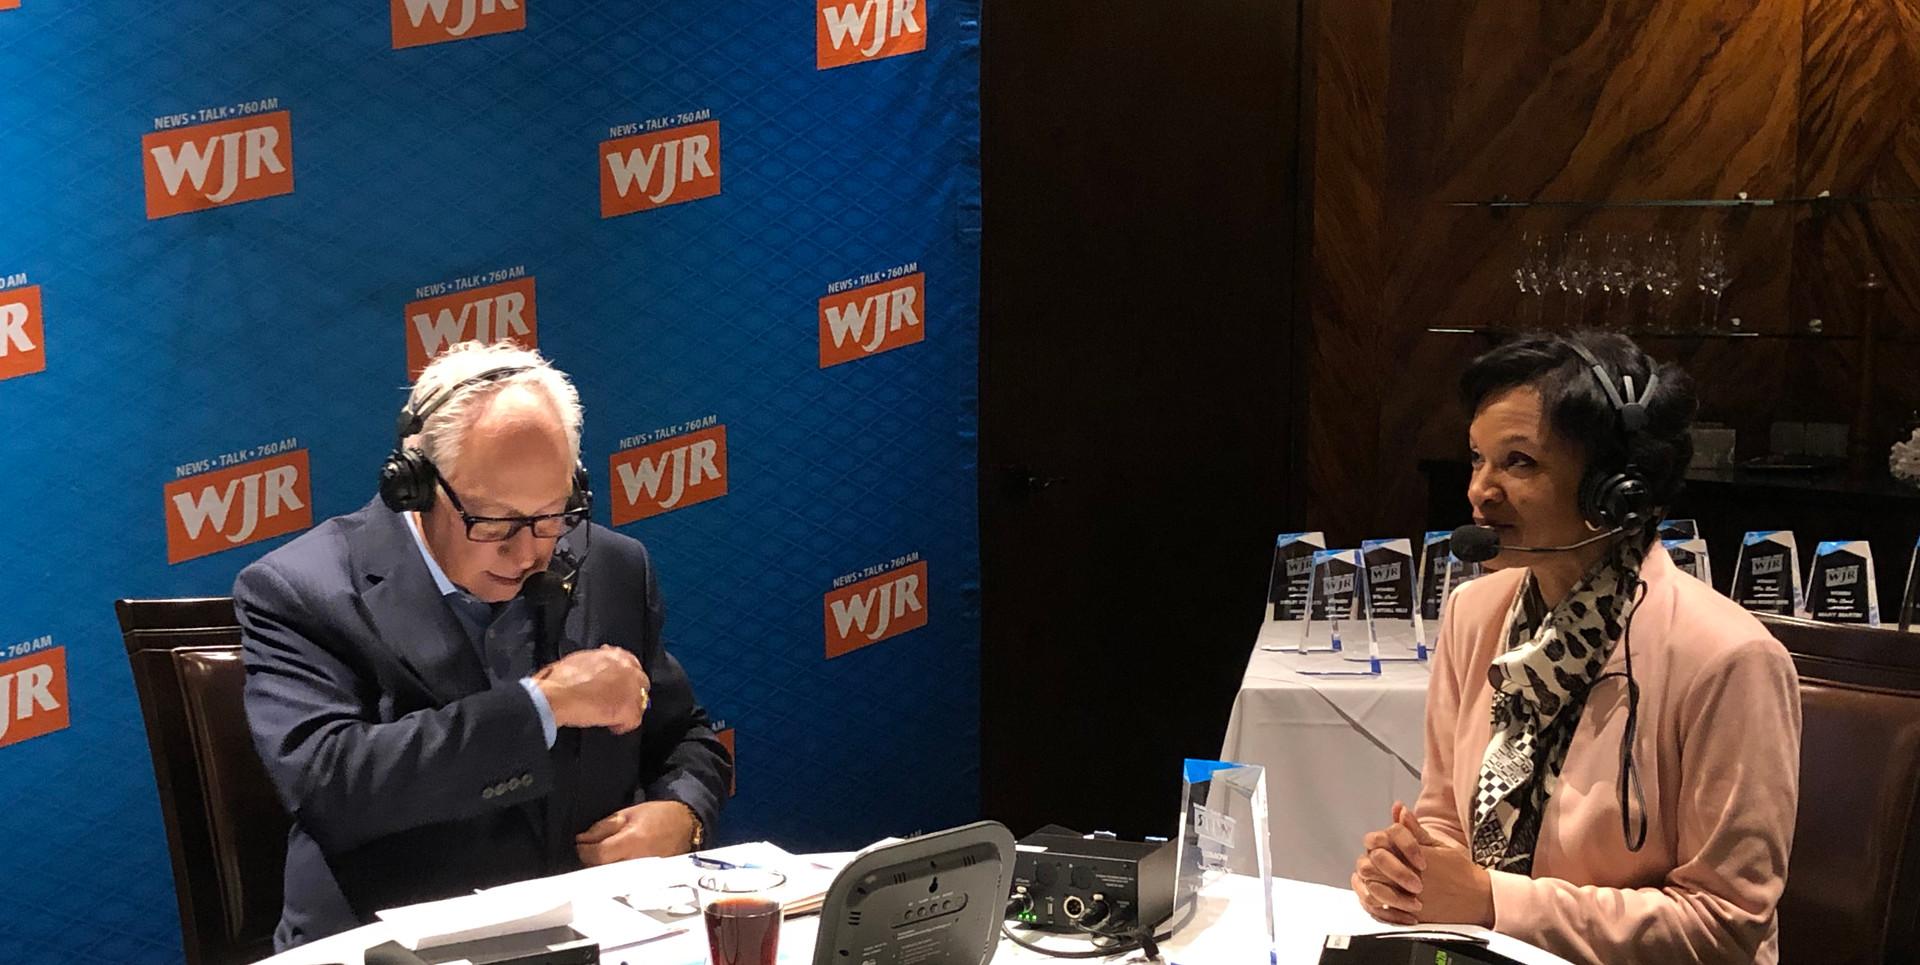 Media Coverage - Paul W. Smith, WJR Radio